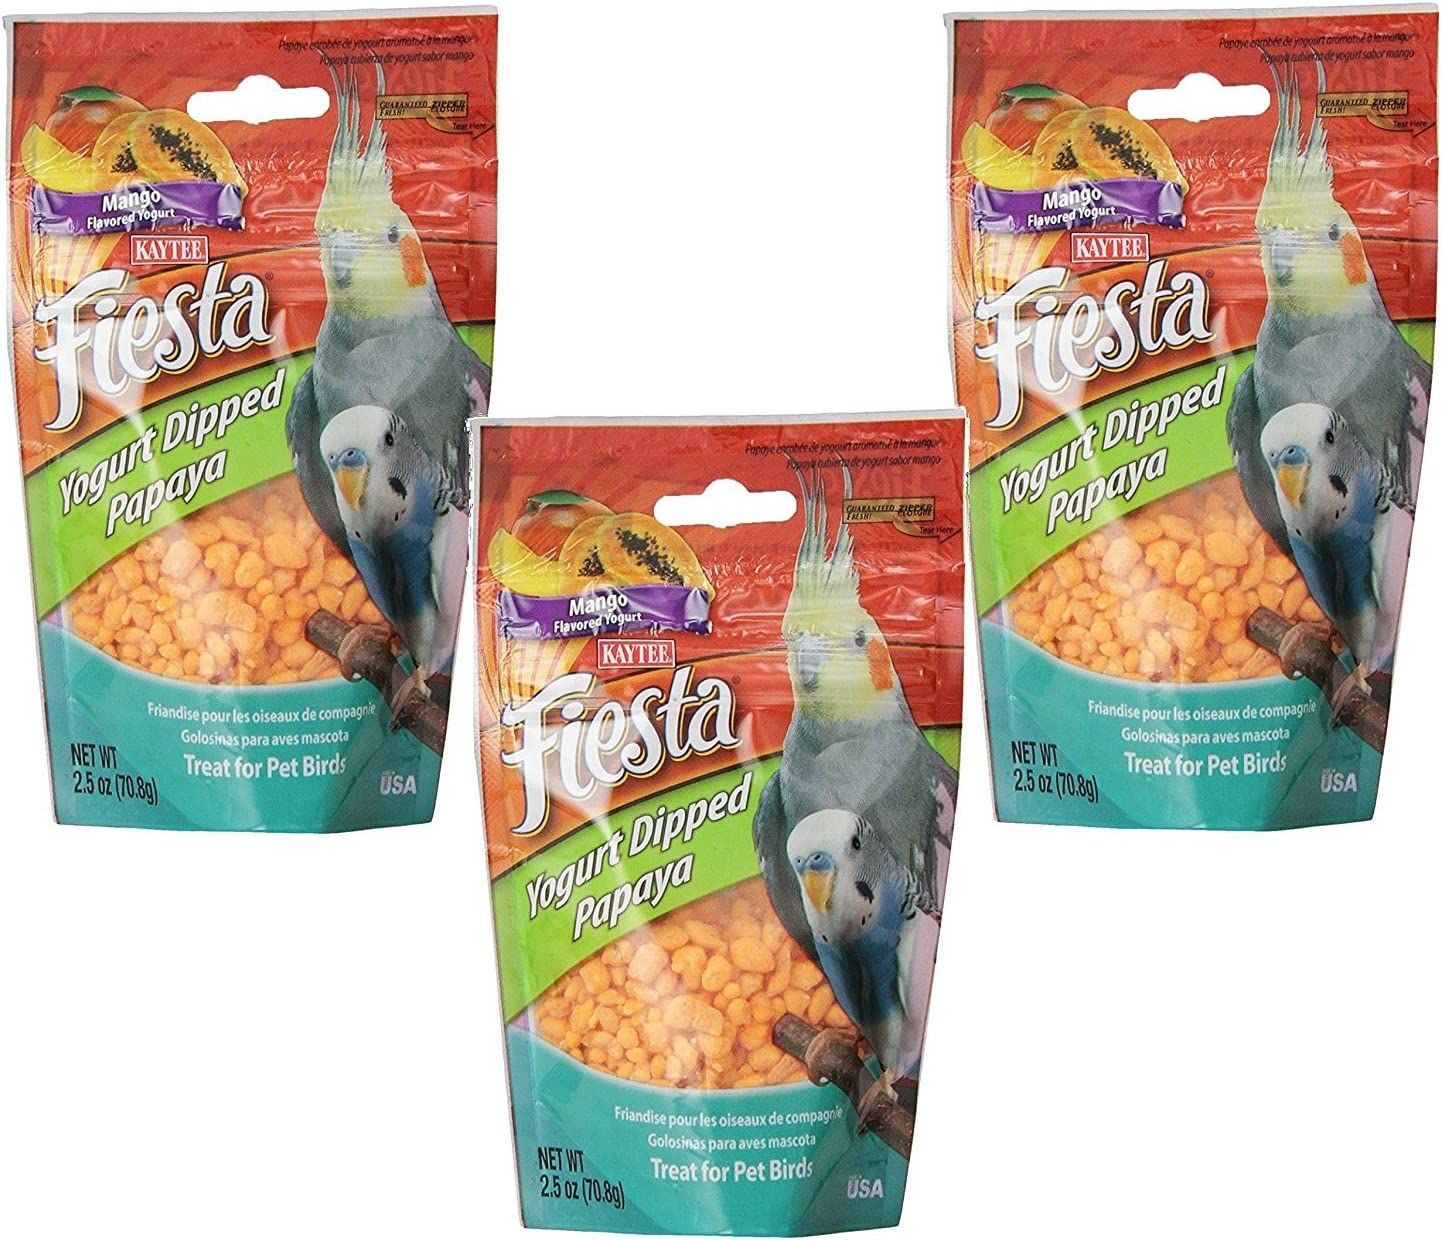 3 Fresno Mall Pack Kaytee Fiesta Mango Bird half Flavored Yogurt Papaya Dipped